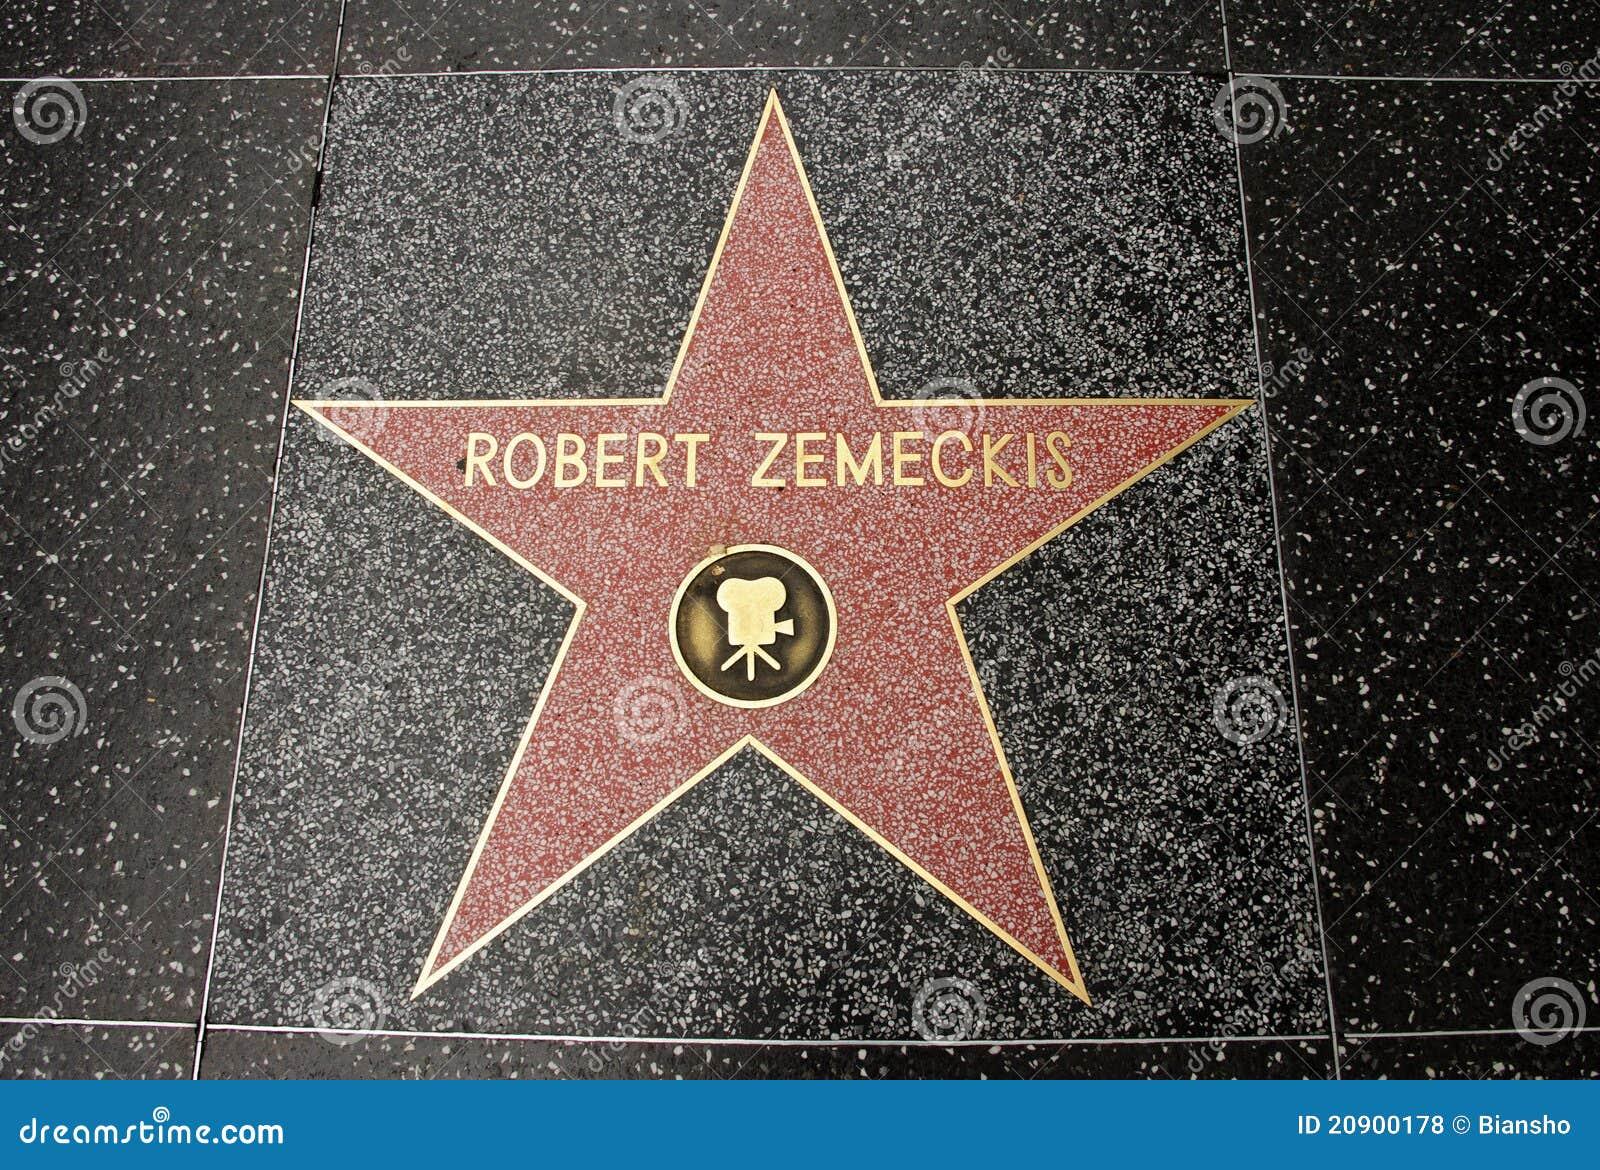 https://thumbs.dreamstime.com/z/star-robert-zemeckis-20900178.jpg